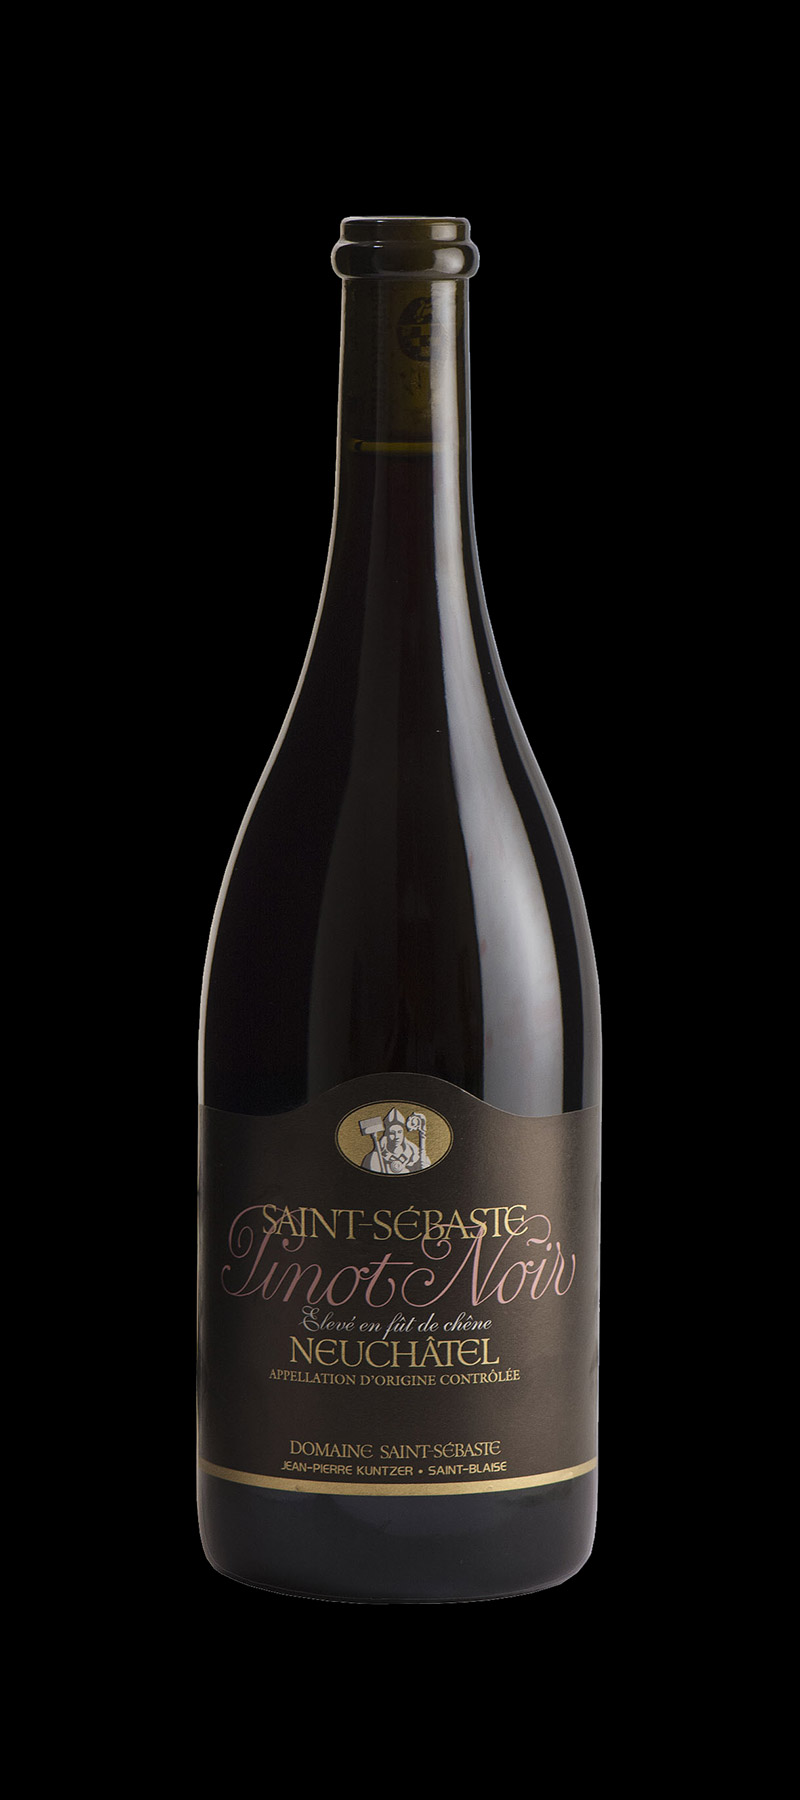 Pinot Noir - Fût de chêne